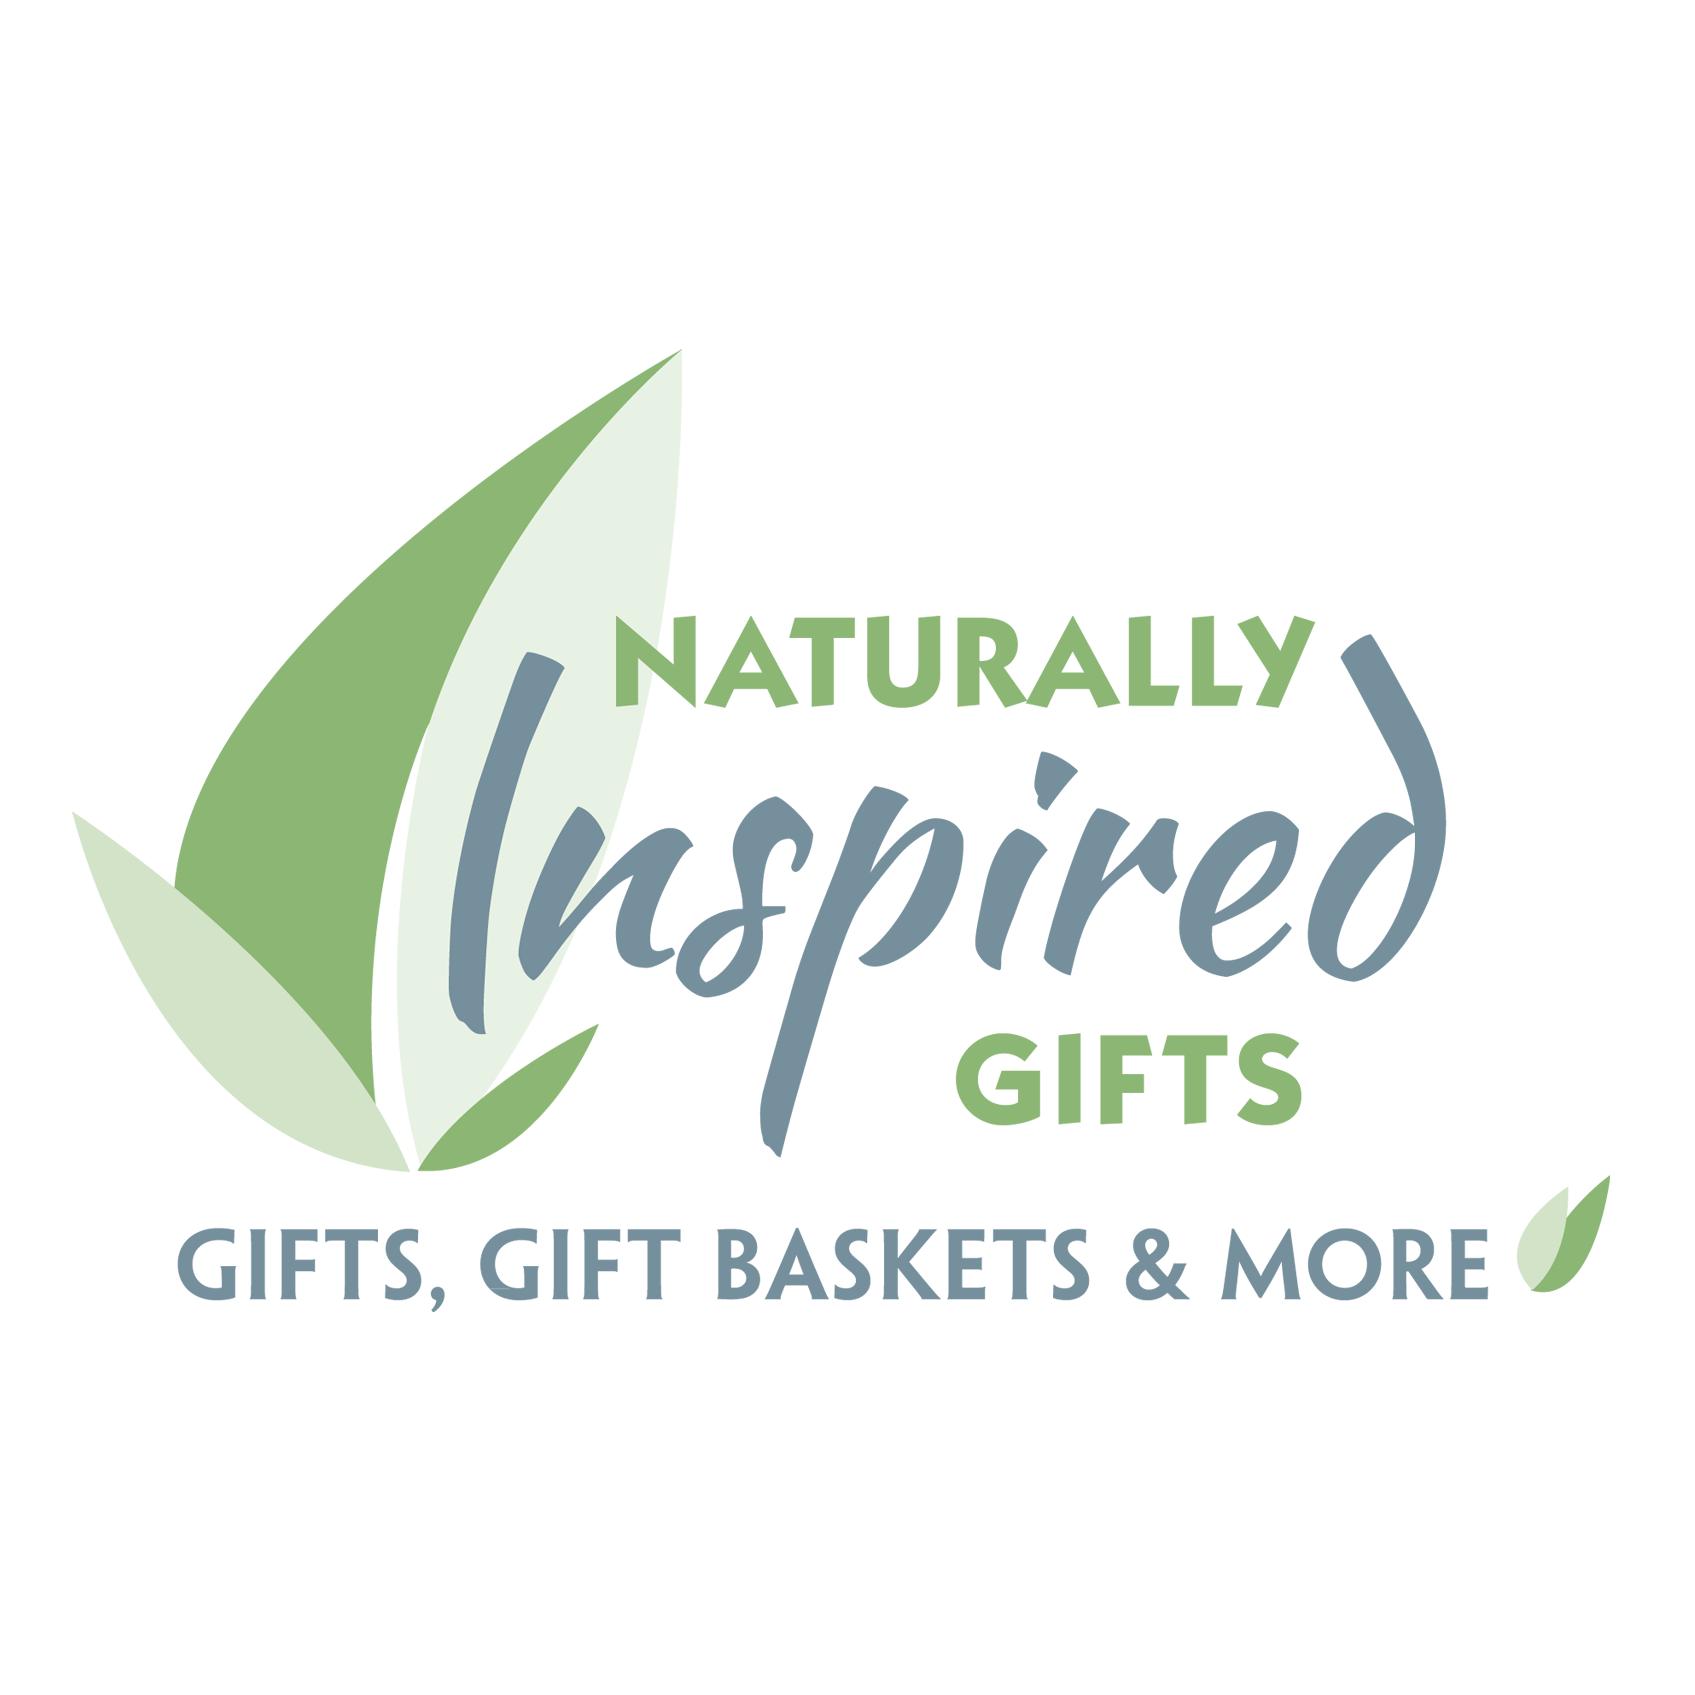 Naturally Inspired Gifts - Kirkwood, MO 63122 - (314)270-3288 | ShowMeLocal.com